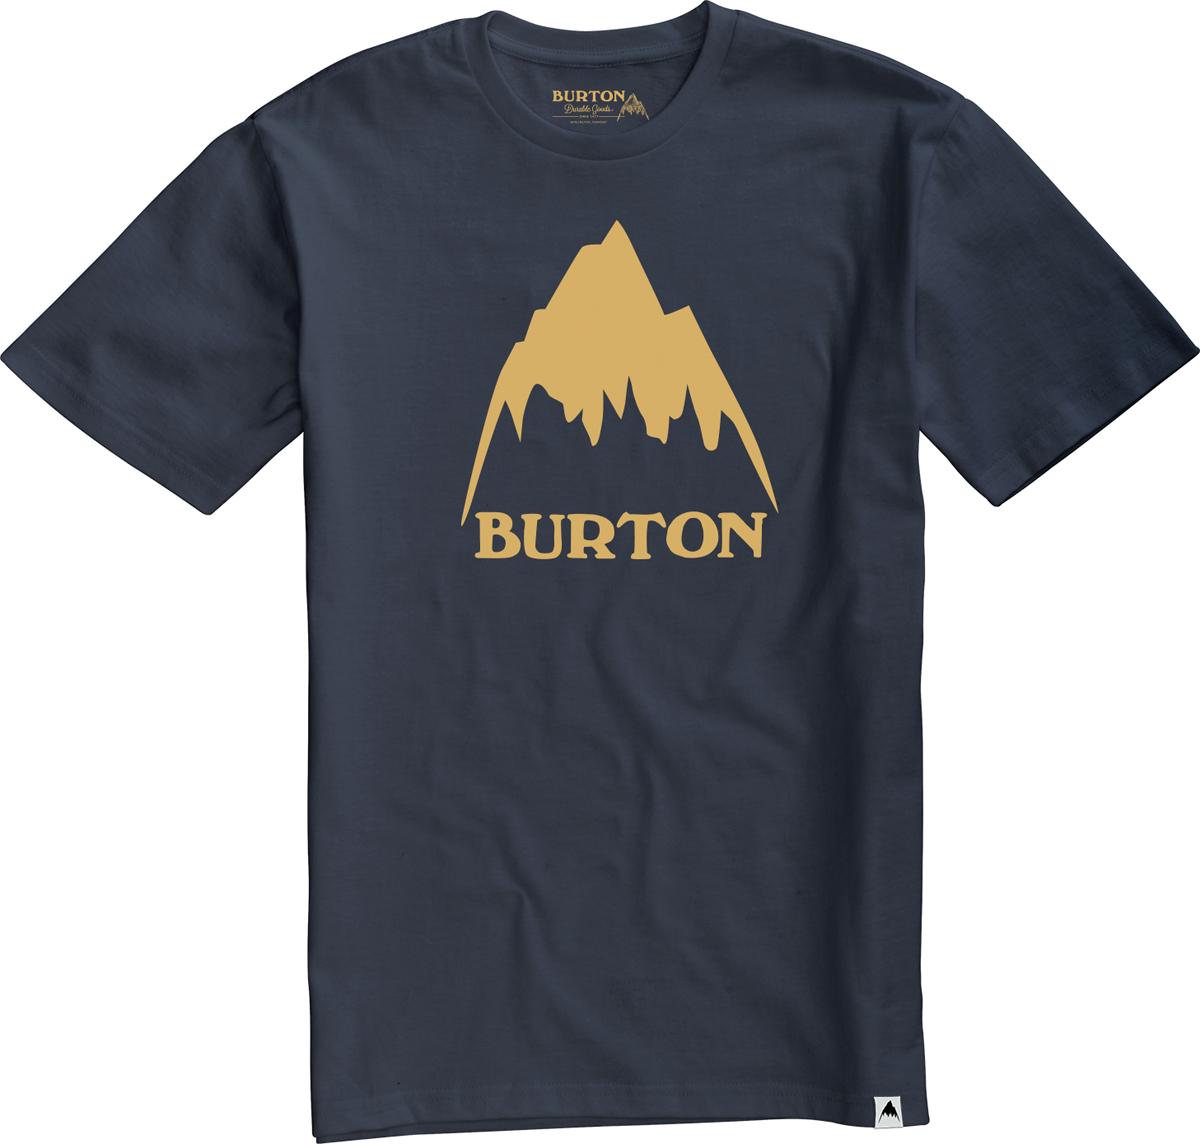 Футболка мужская Burton Mb Clssmtnhgh Ss, цвет: темно-синий. 13882105400. Размер XXL (54) burton футболка